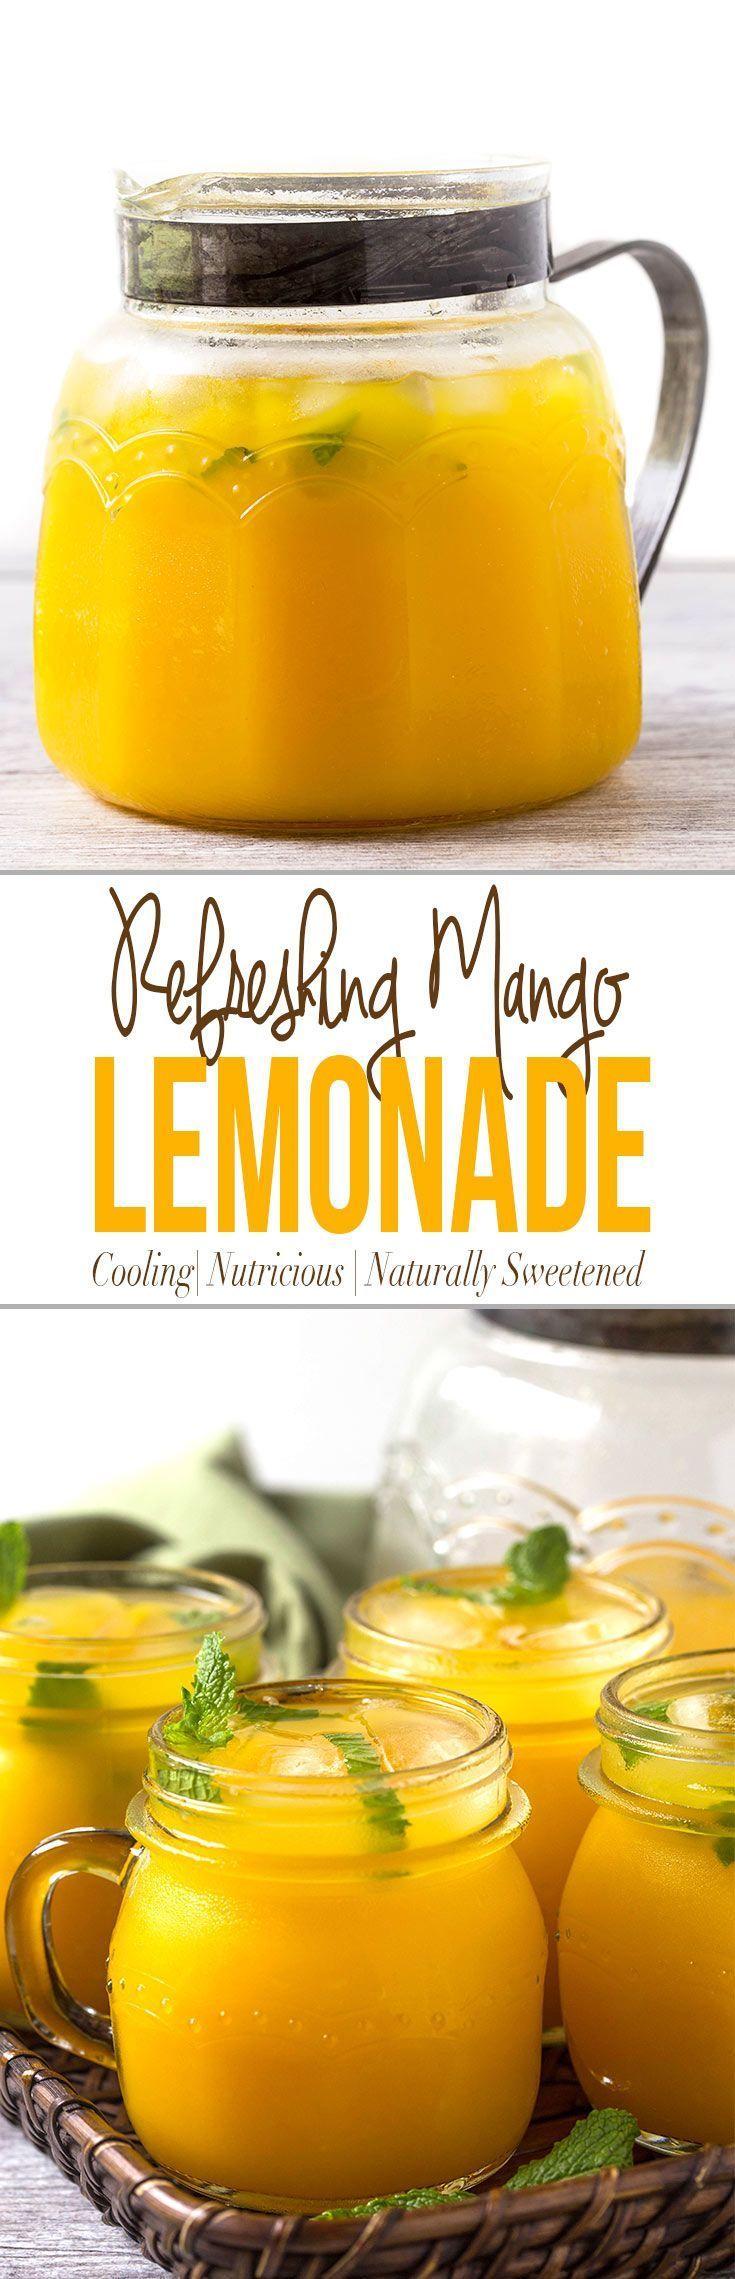 Refreshing mango lemonade to enjoy hot summer days. Prepared using fresh zesty lemon juice, honey, & mango pulp. Healthy, delicious & naturally sweetened fresh lemonade via @watchwhatueat (Vegan Bbq Dessert)